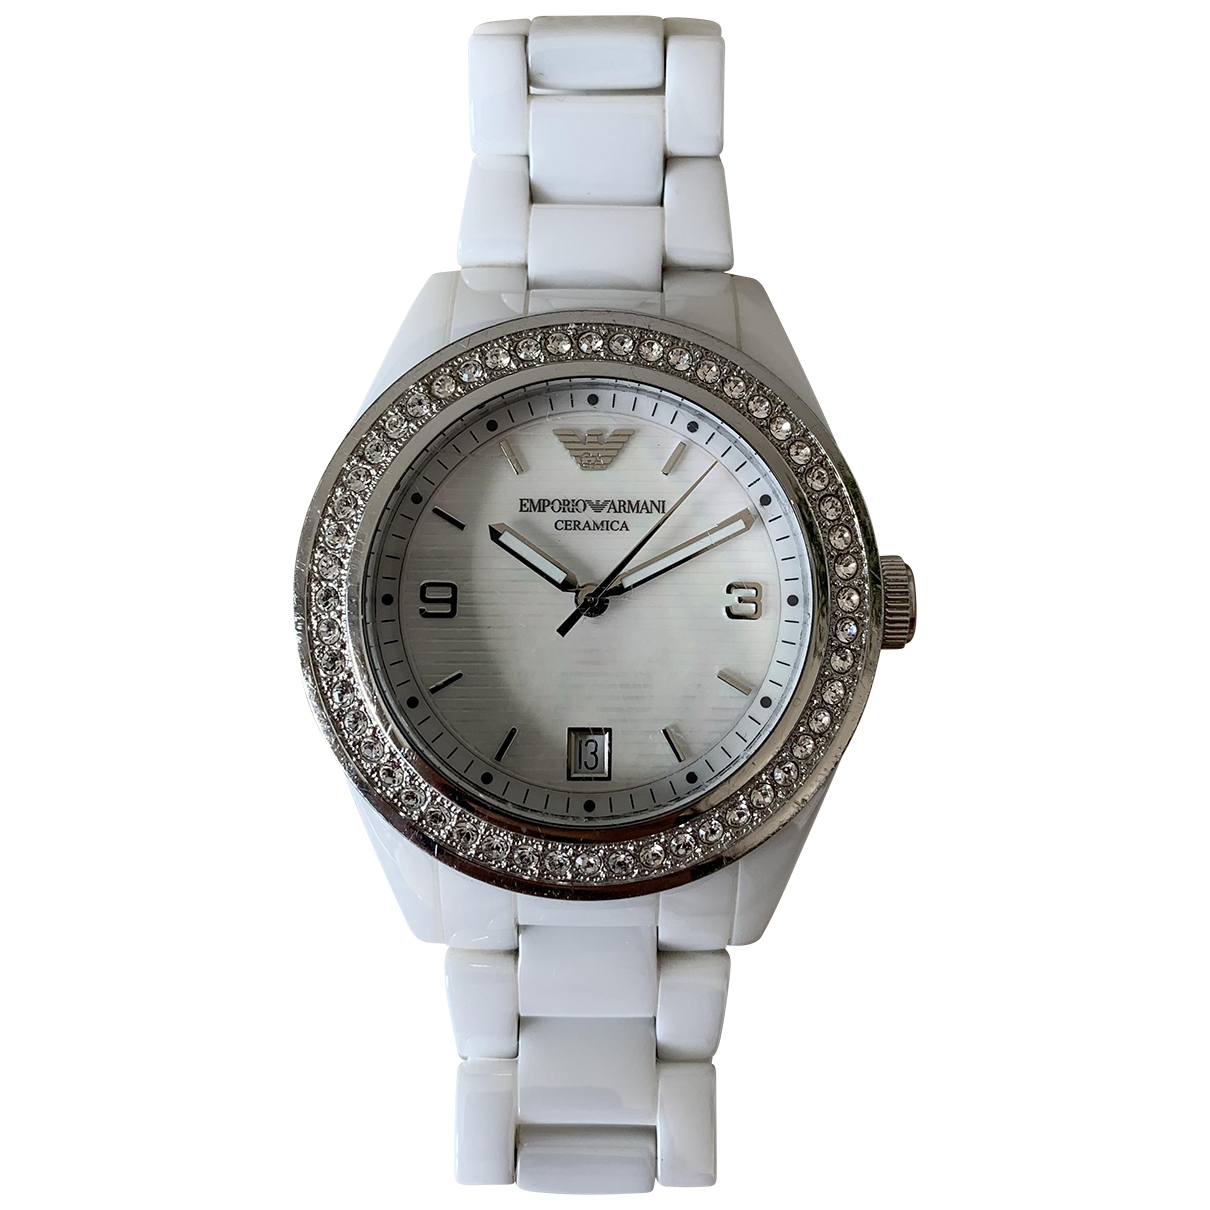 Reloj de Ceramica Emporio Armani